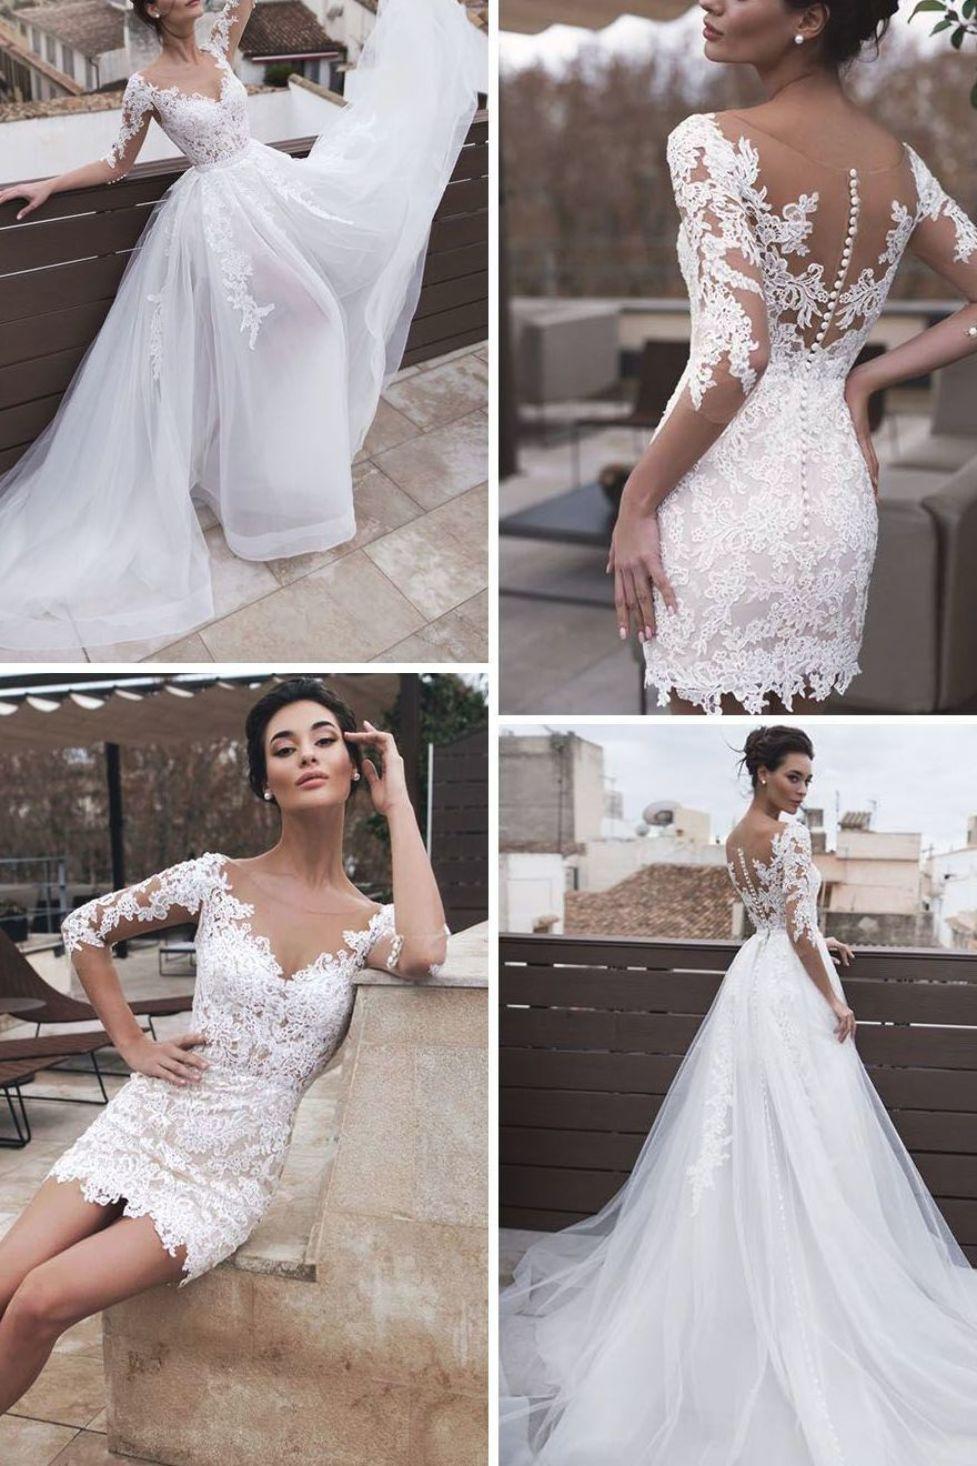 Marvelous Tulle & Organza Jewel Neckline 20 In 20 Wedding Dresses ...